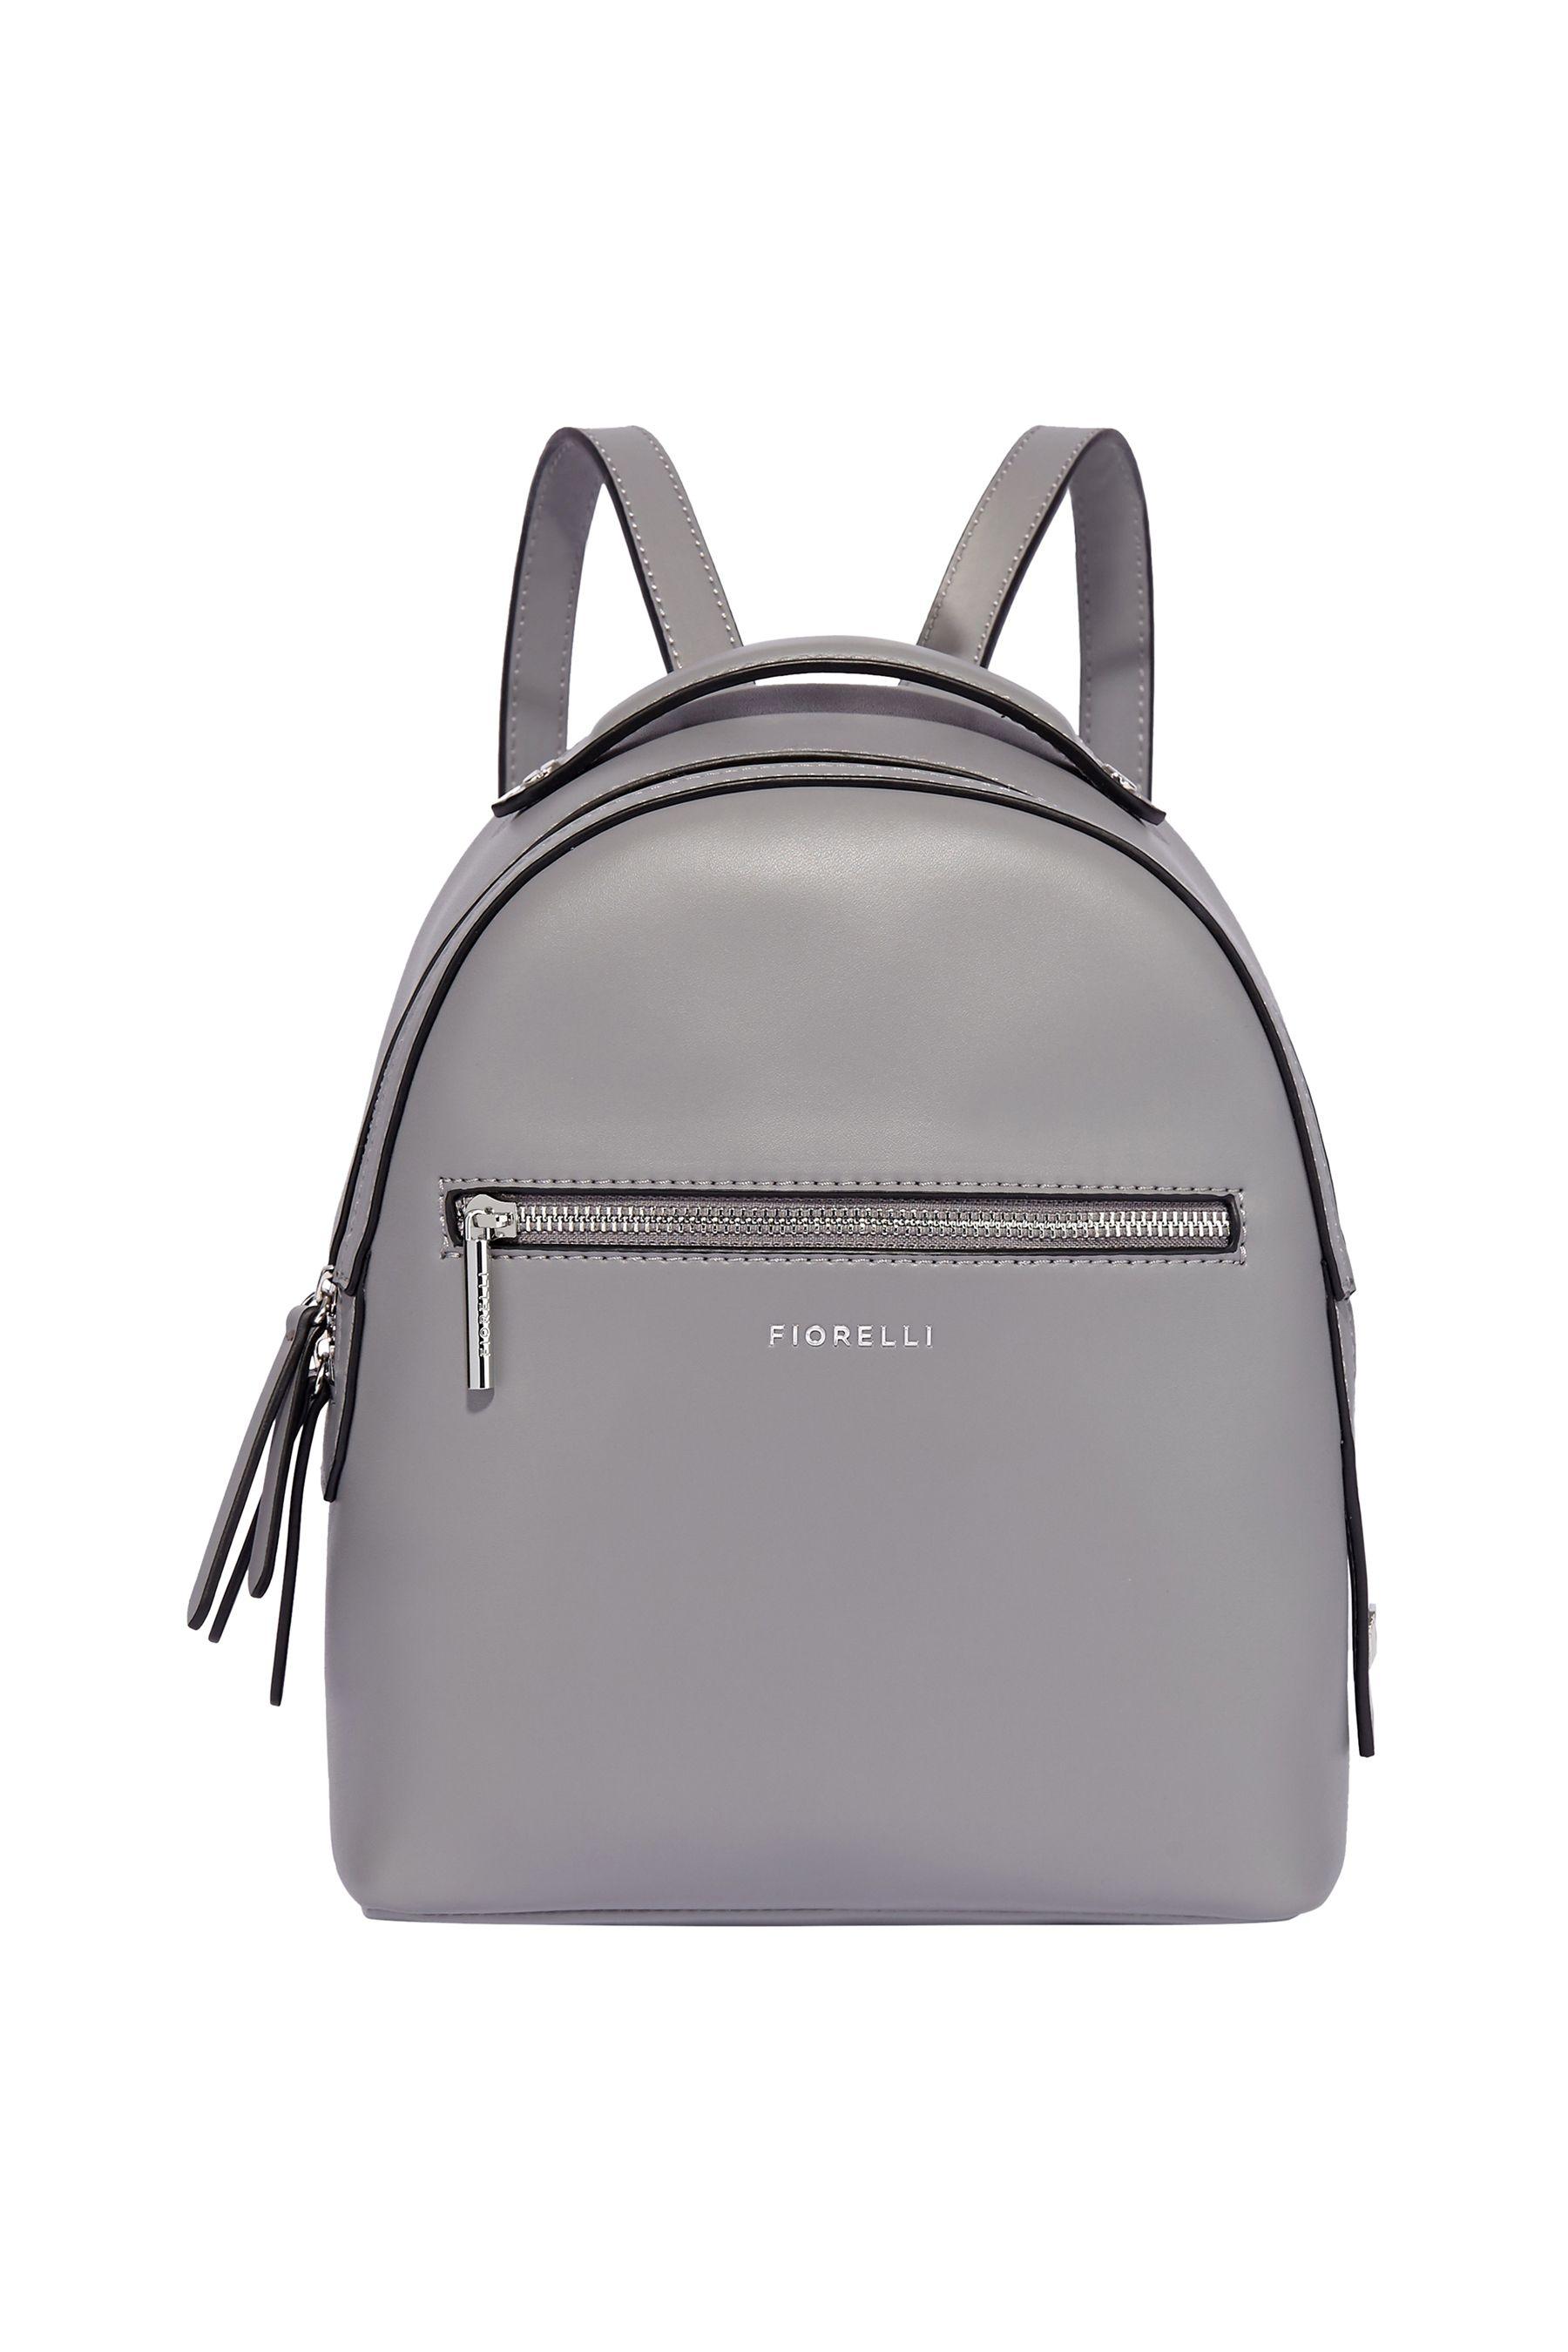 310cbadd6389 Womens Fiorelli Anouk Backpack - Grey